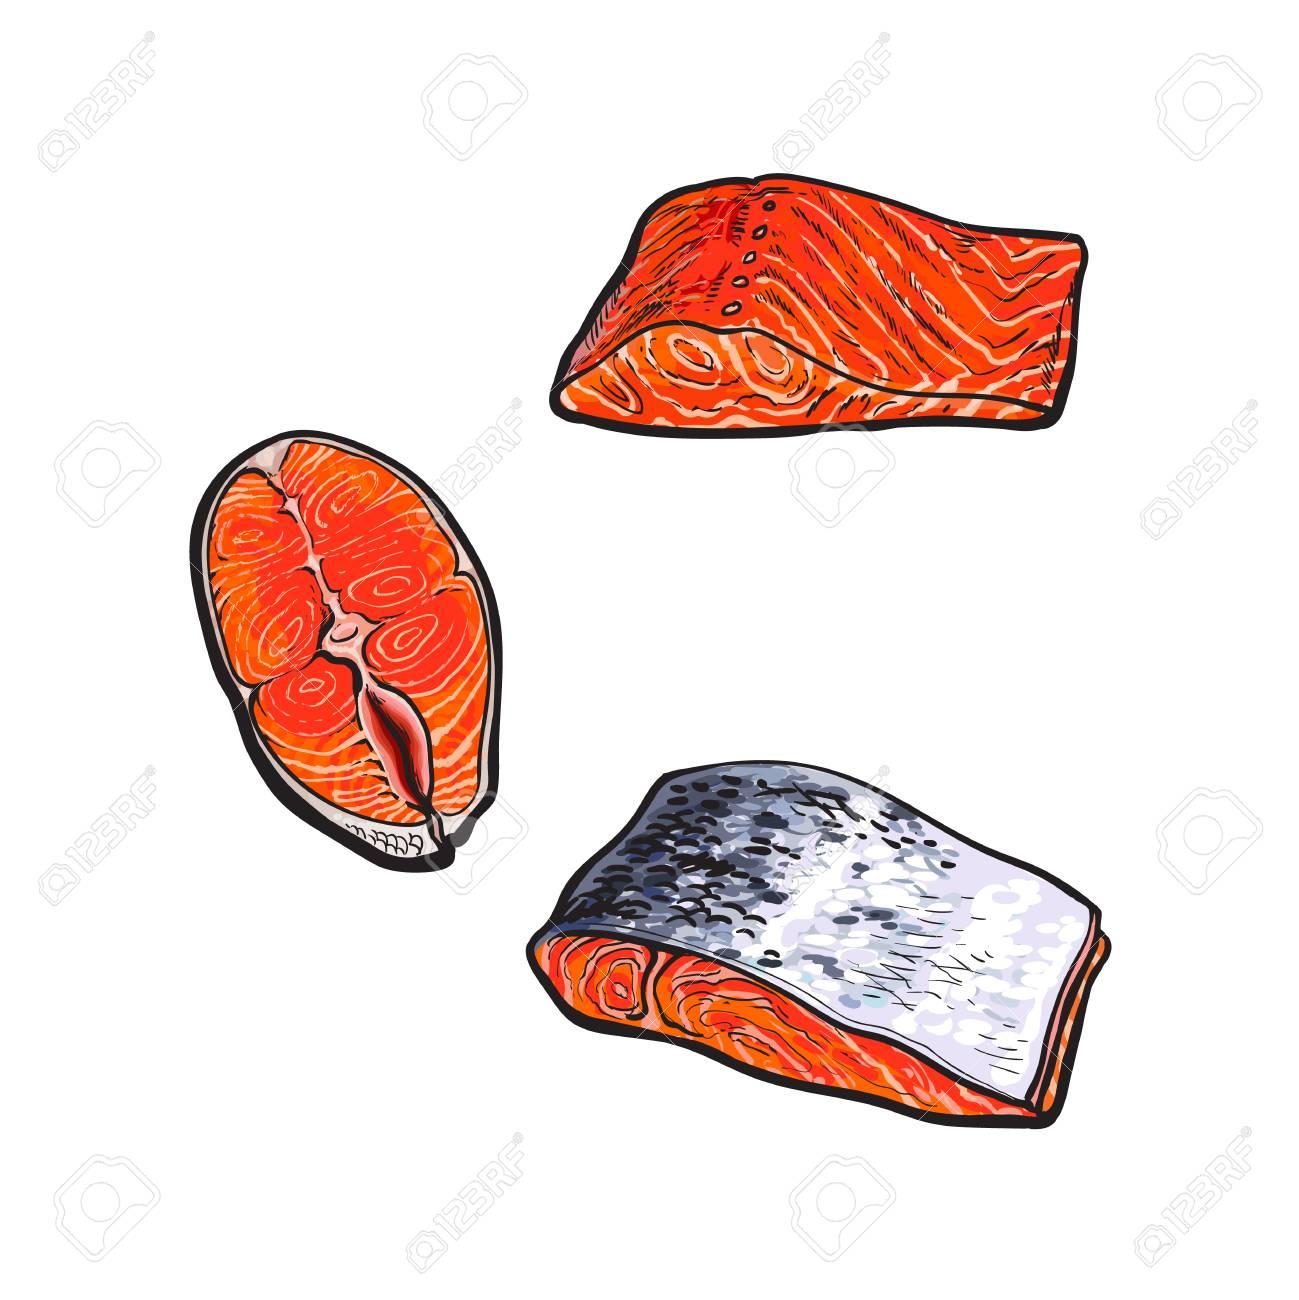 Estilo De Dibujo Vectorial Filete De Filete De Carne De Pescado De